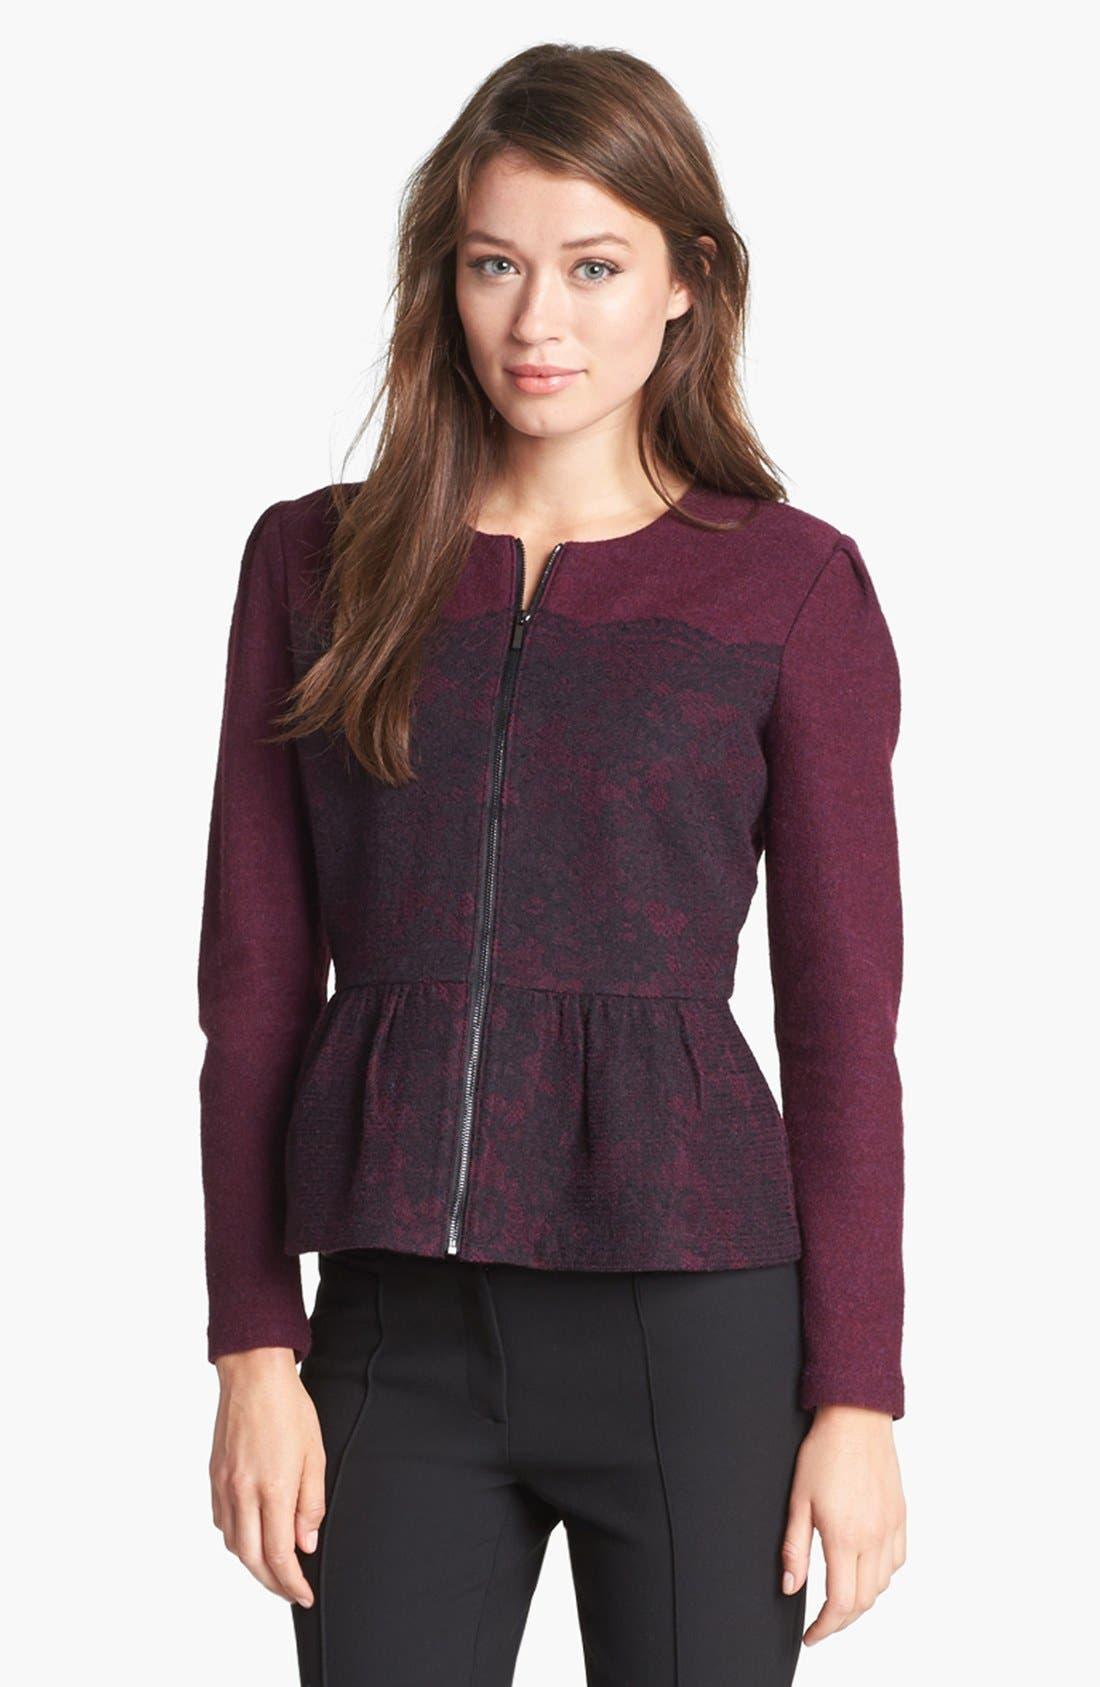 Main Image - Classiques Entier® Merino & Lace Zip Cardigan